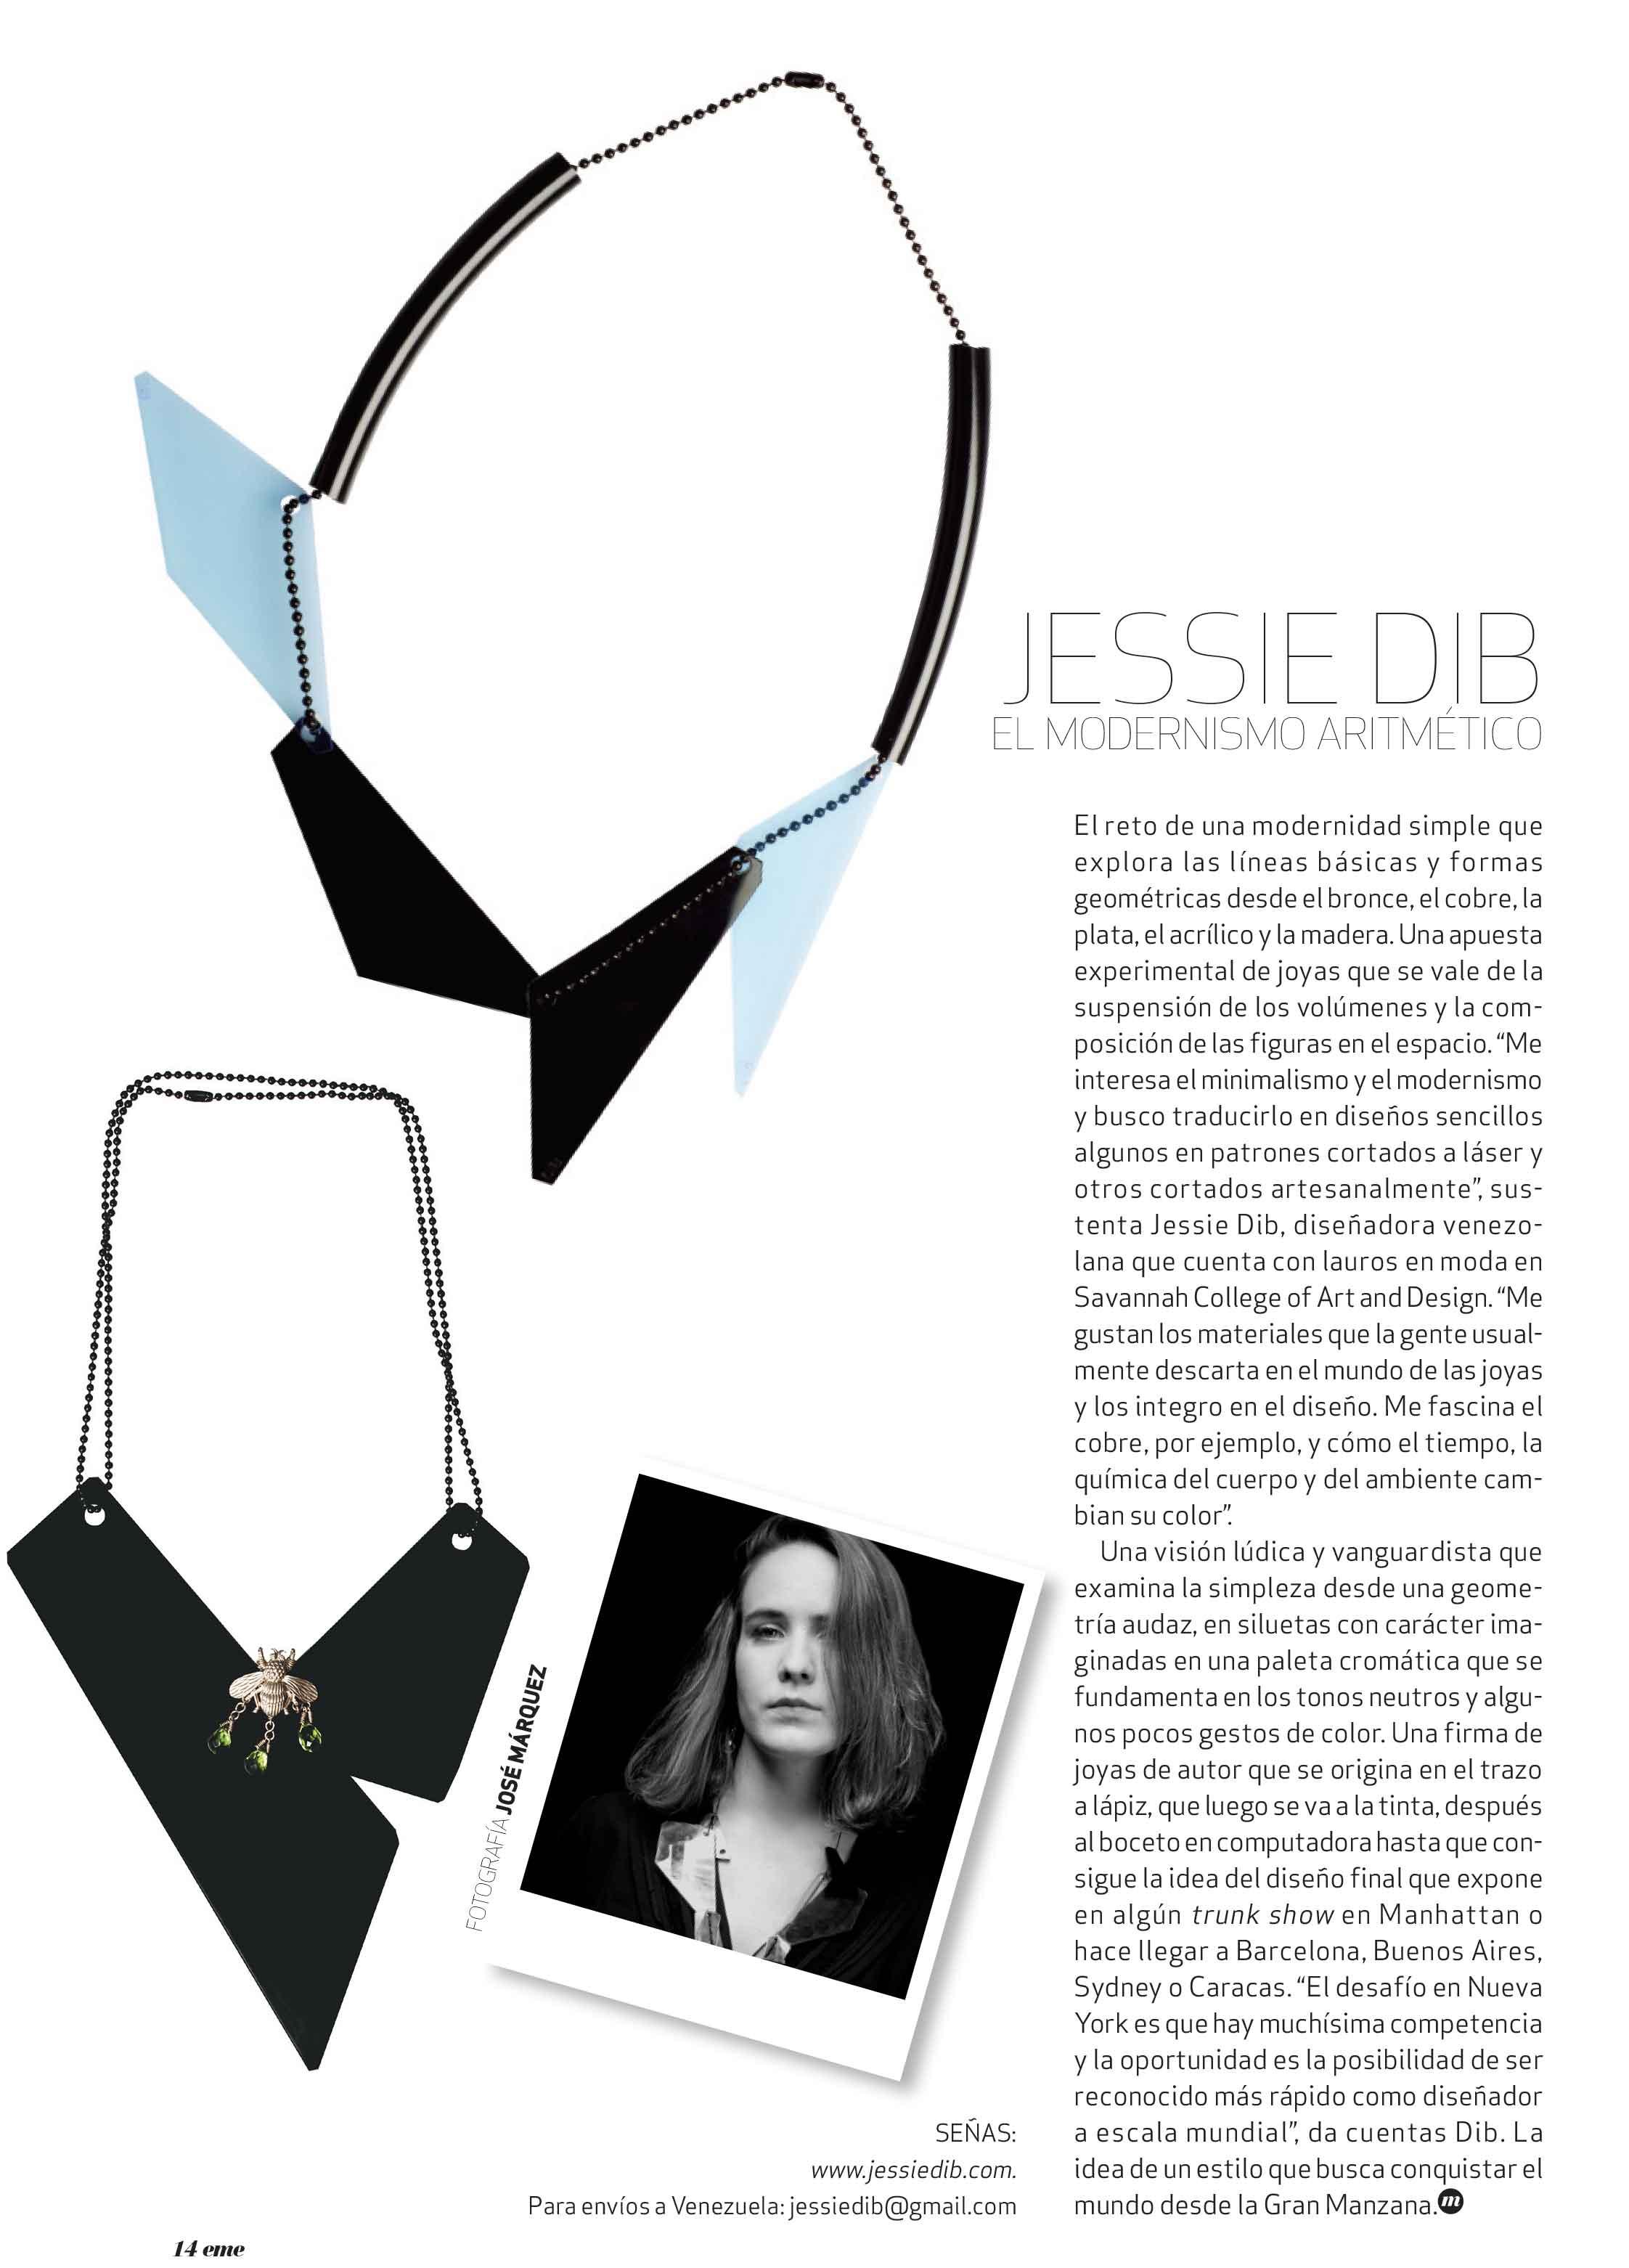 Jessie-Dib-Press-Eme-Venezuela-feature